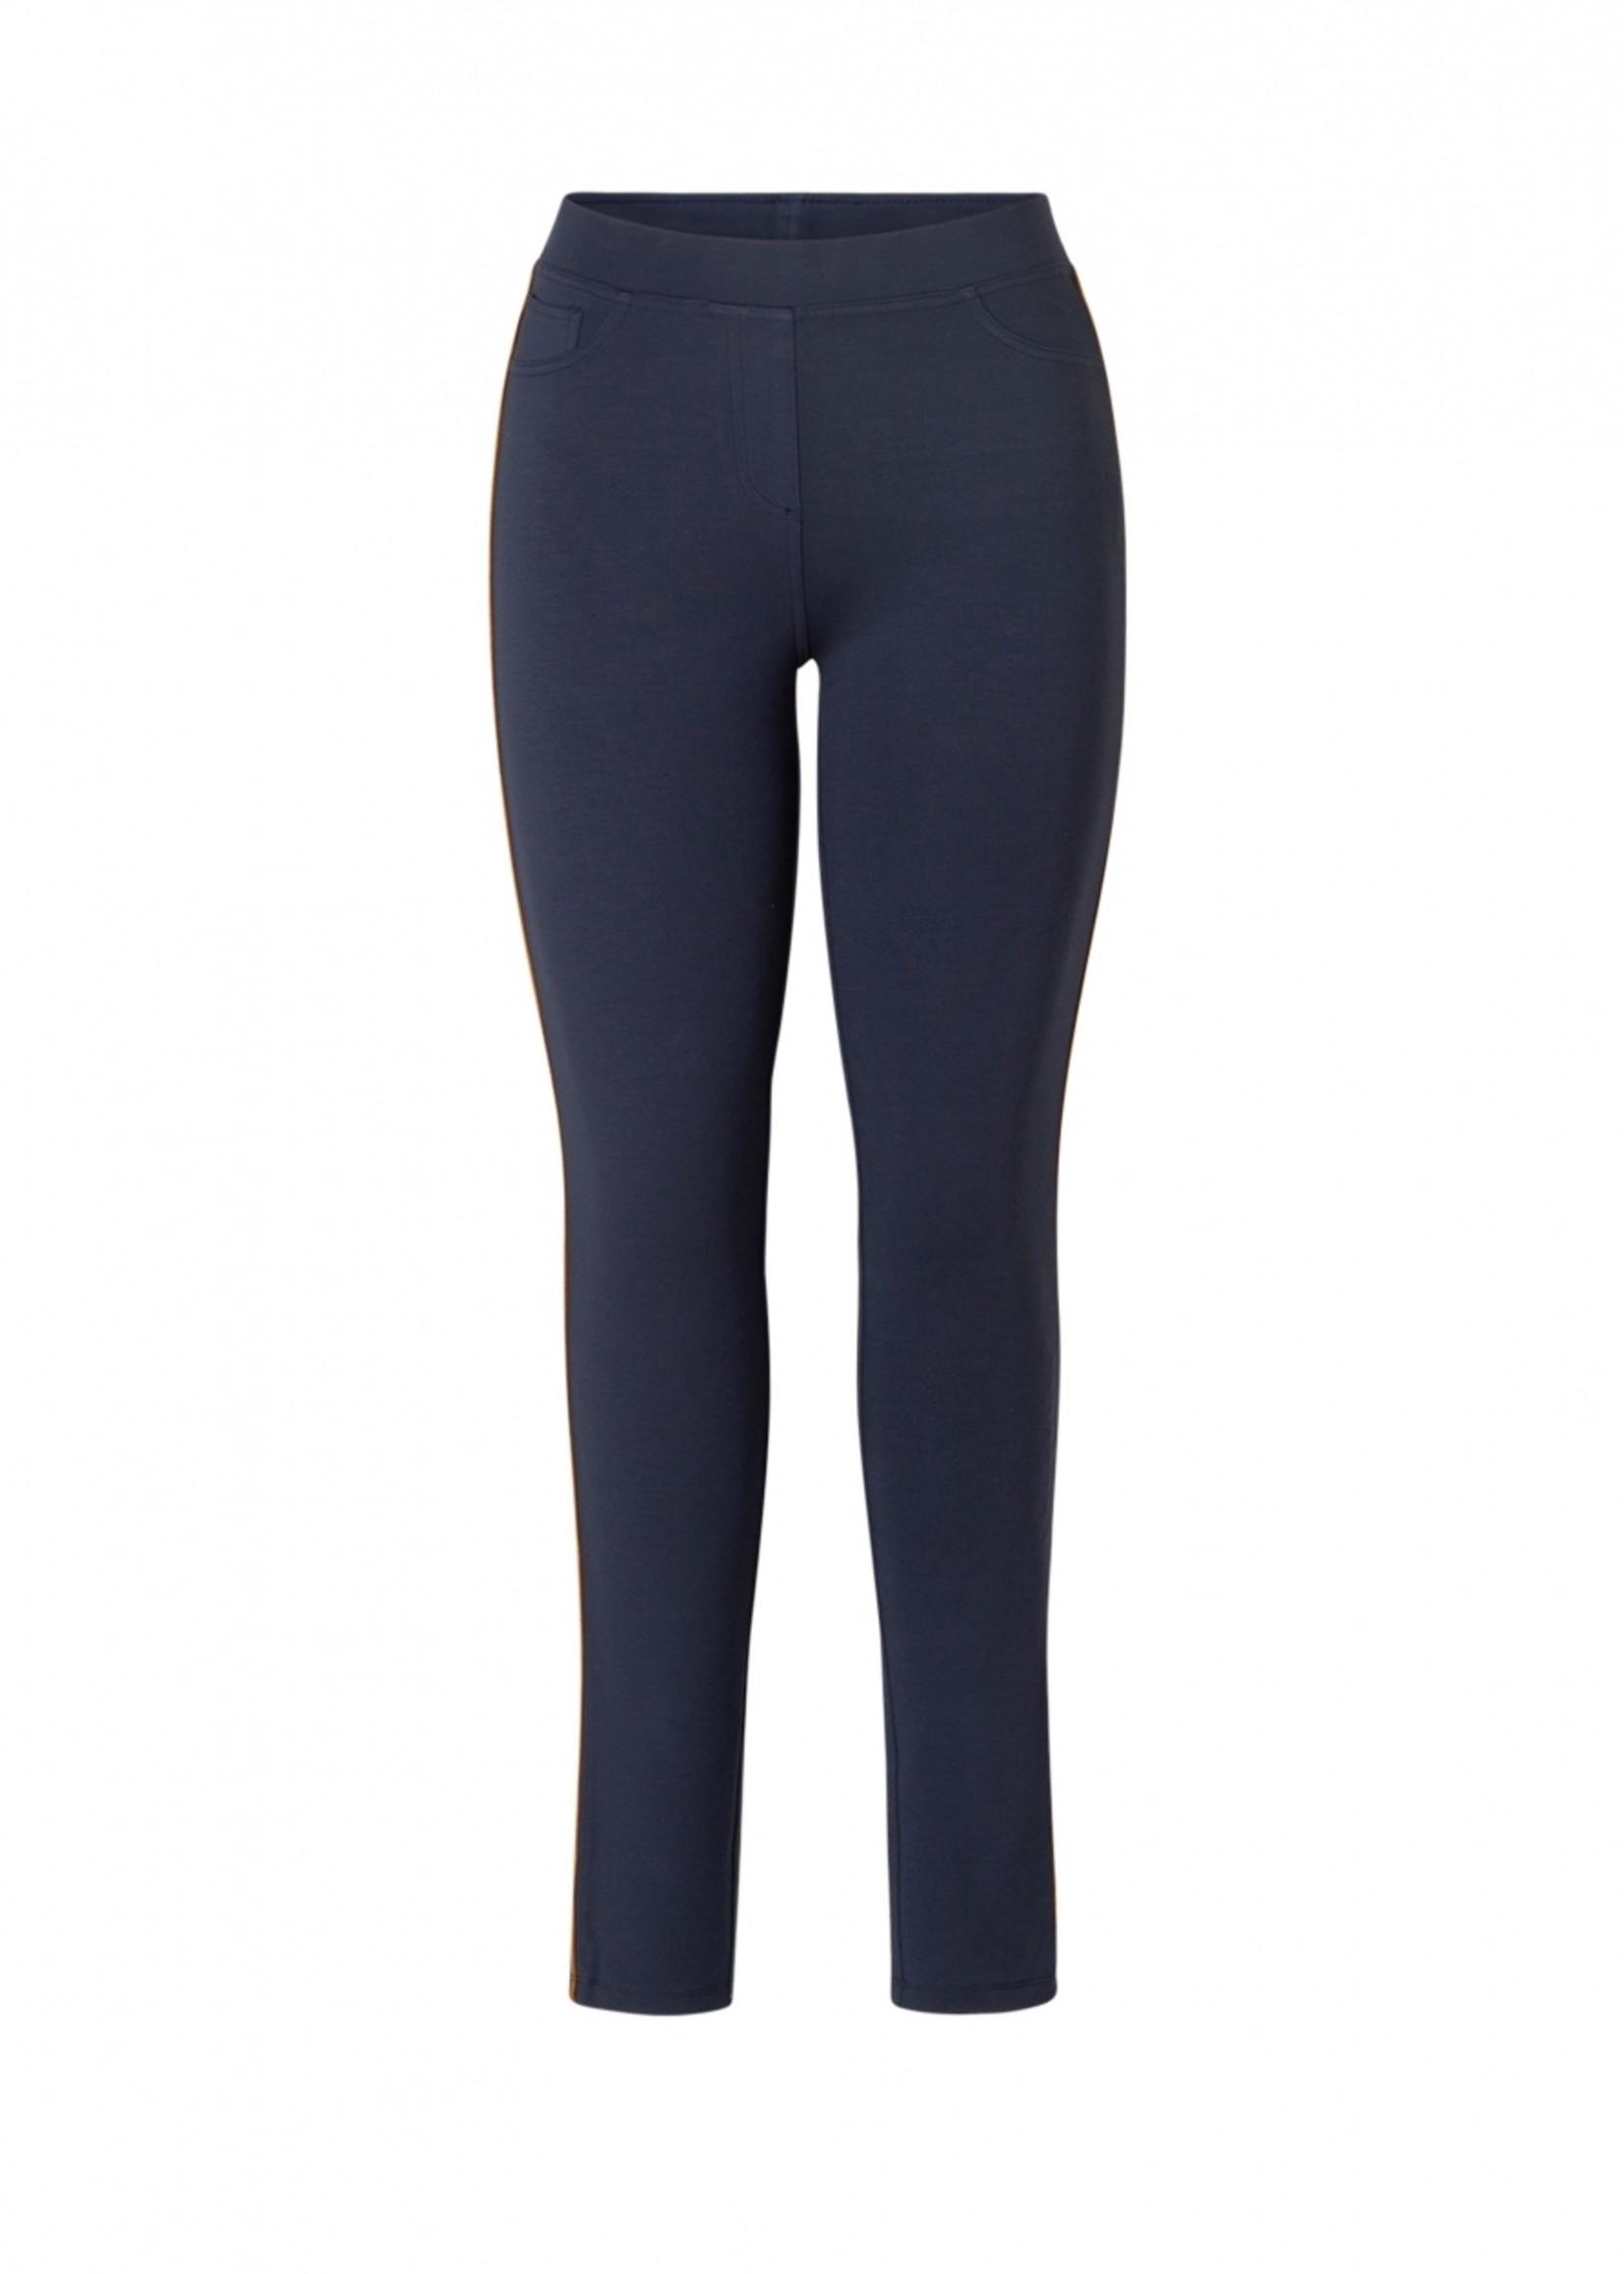 Yesta A002352 pantalon Arnika Essential